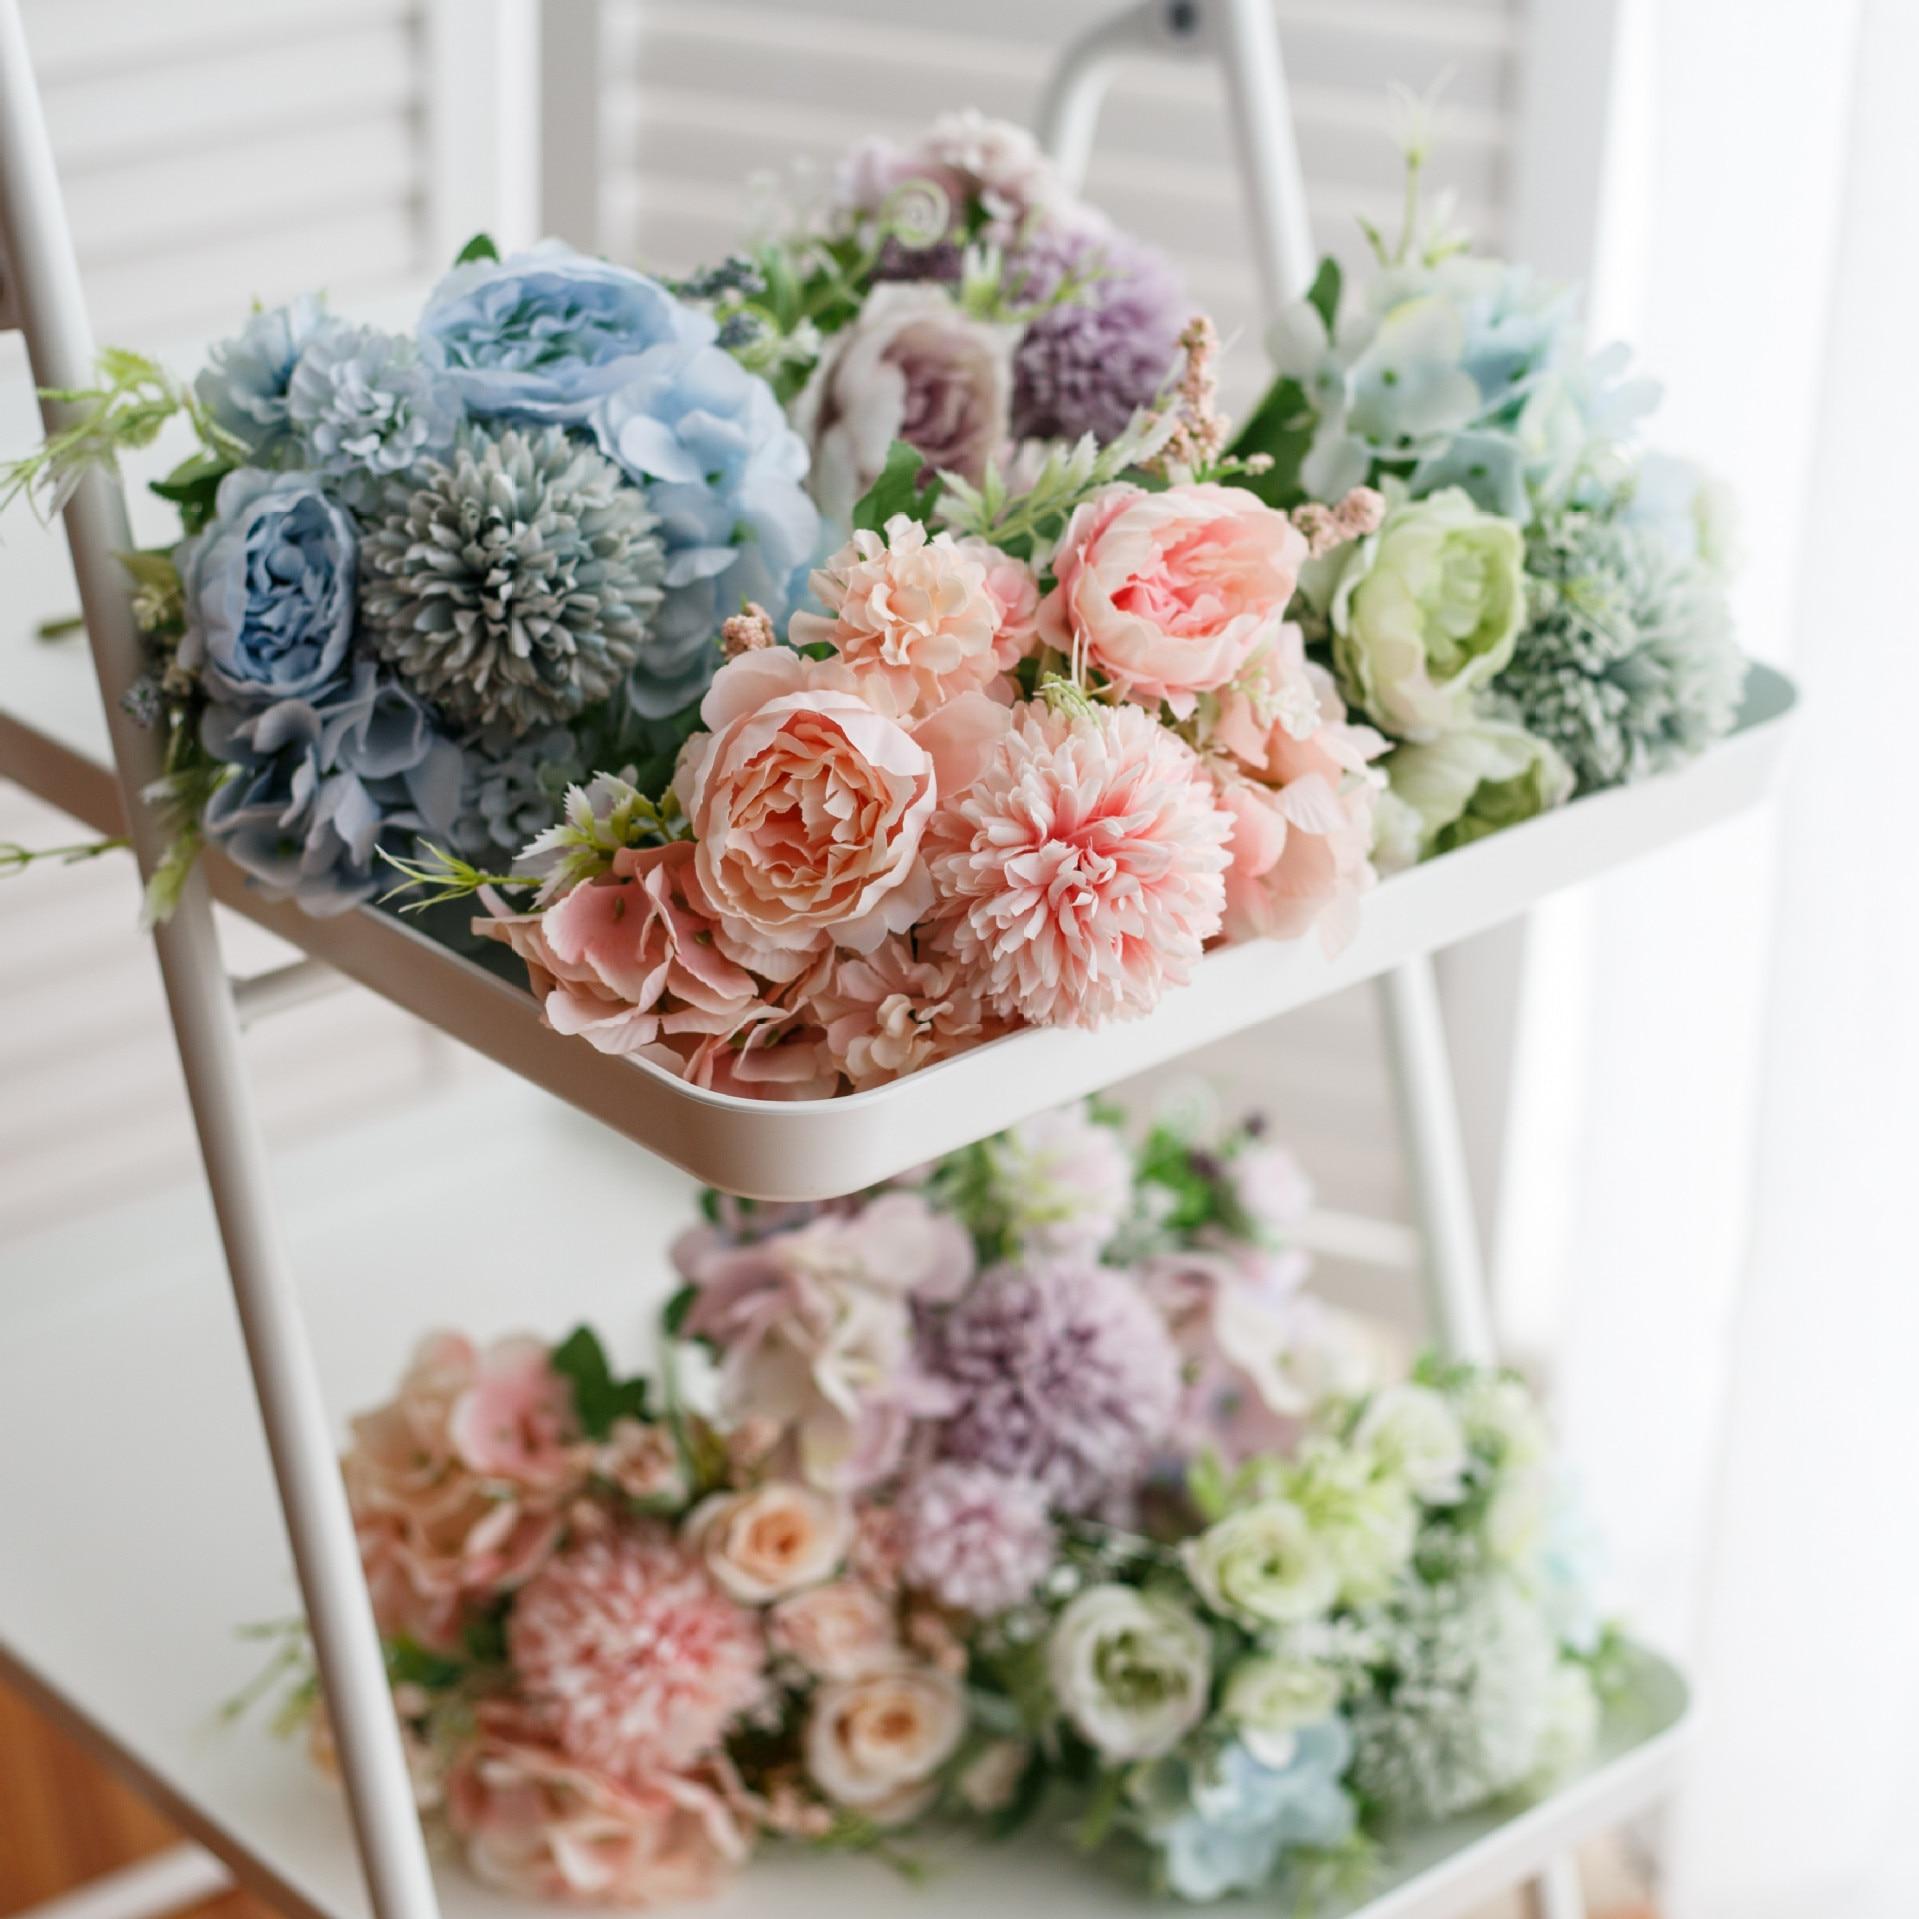 Simulación nórdica flor peonía ramo de boda accesorios de boda flores decoración del hogar plantas artificiales para bodas Pared de flores